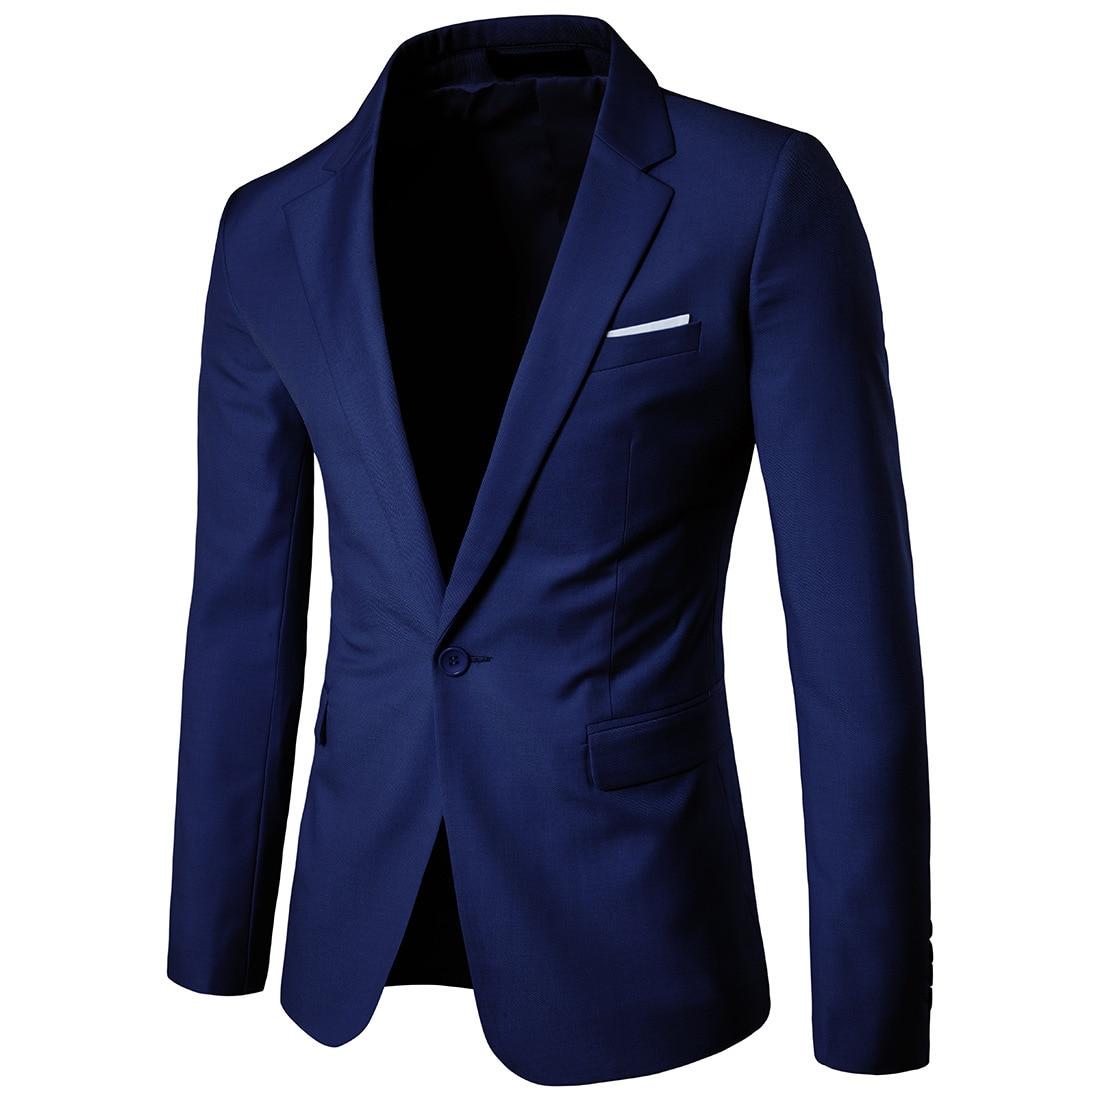 Business Leisure Suit Lang Best Man Wedding One-Button Suit Jacket Men'S Wear Navy Xf001 West